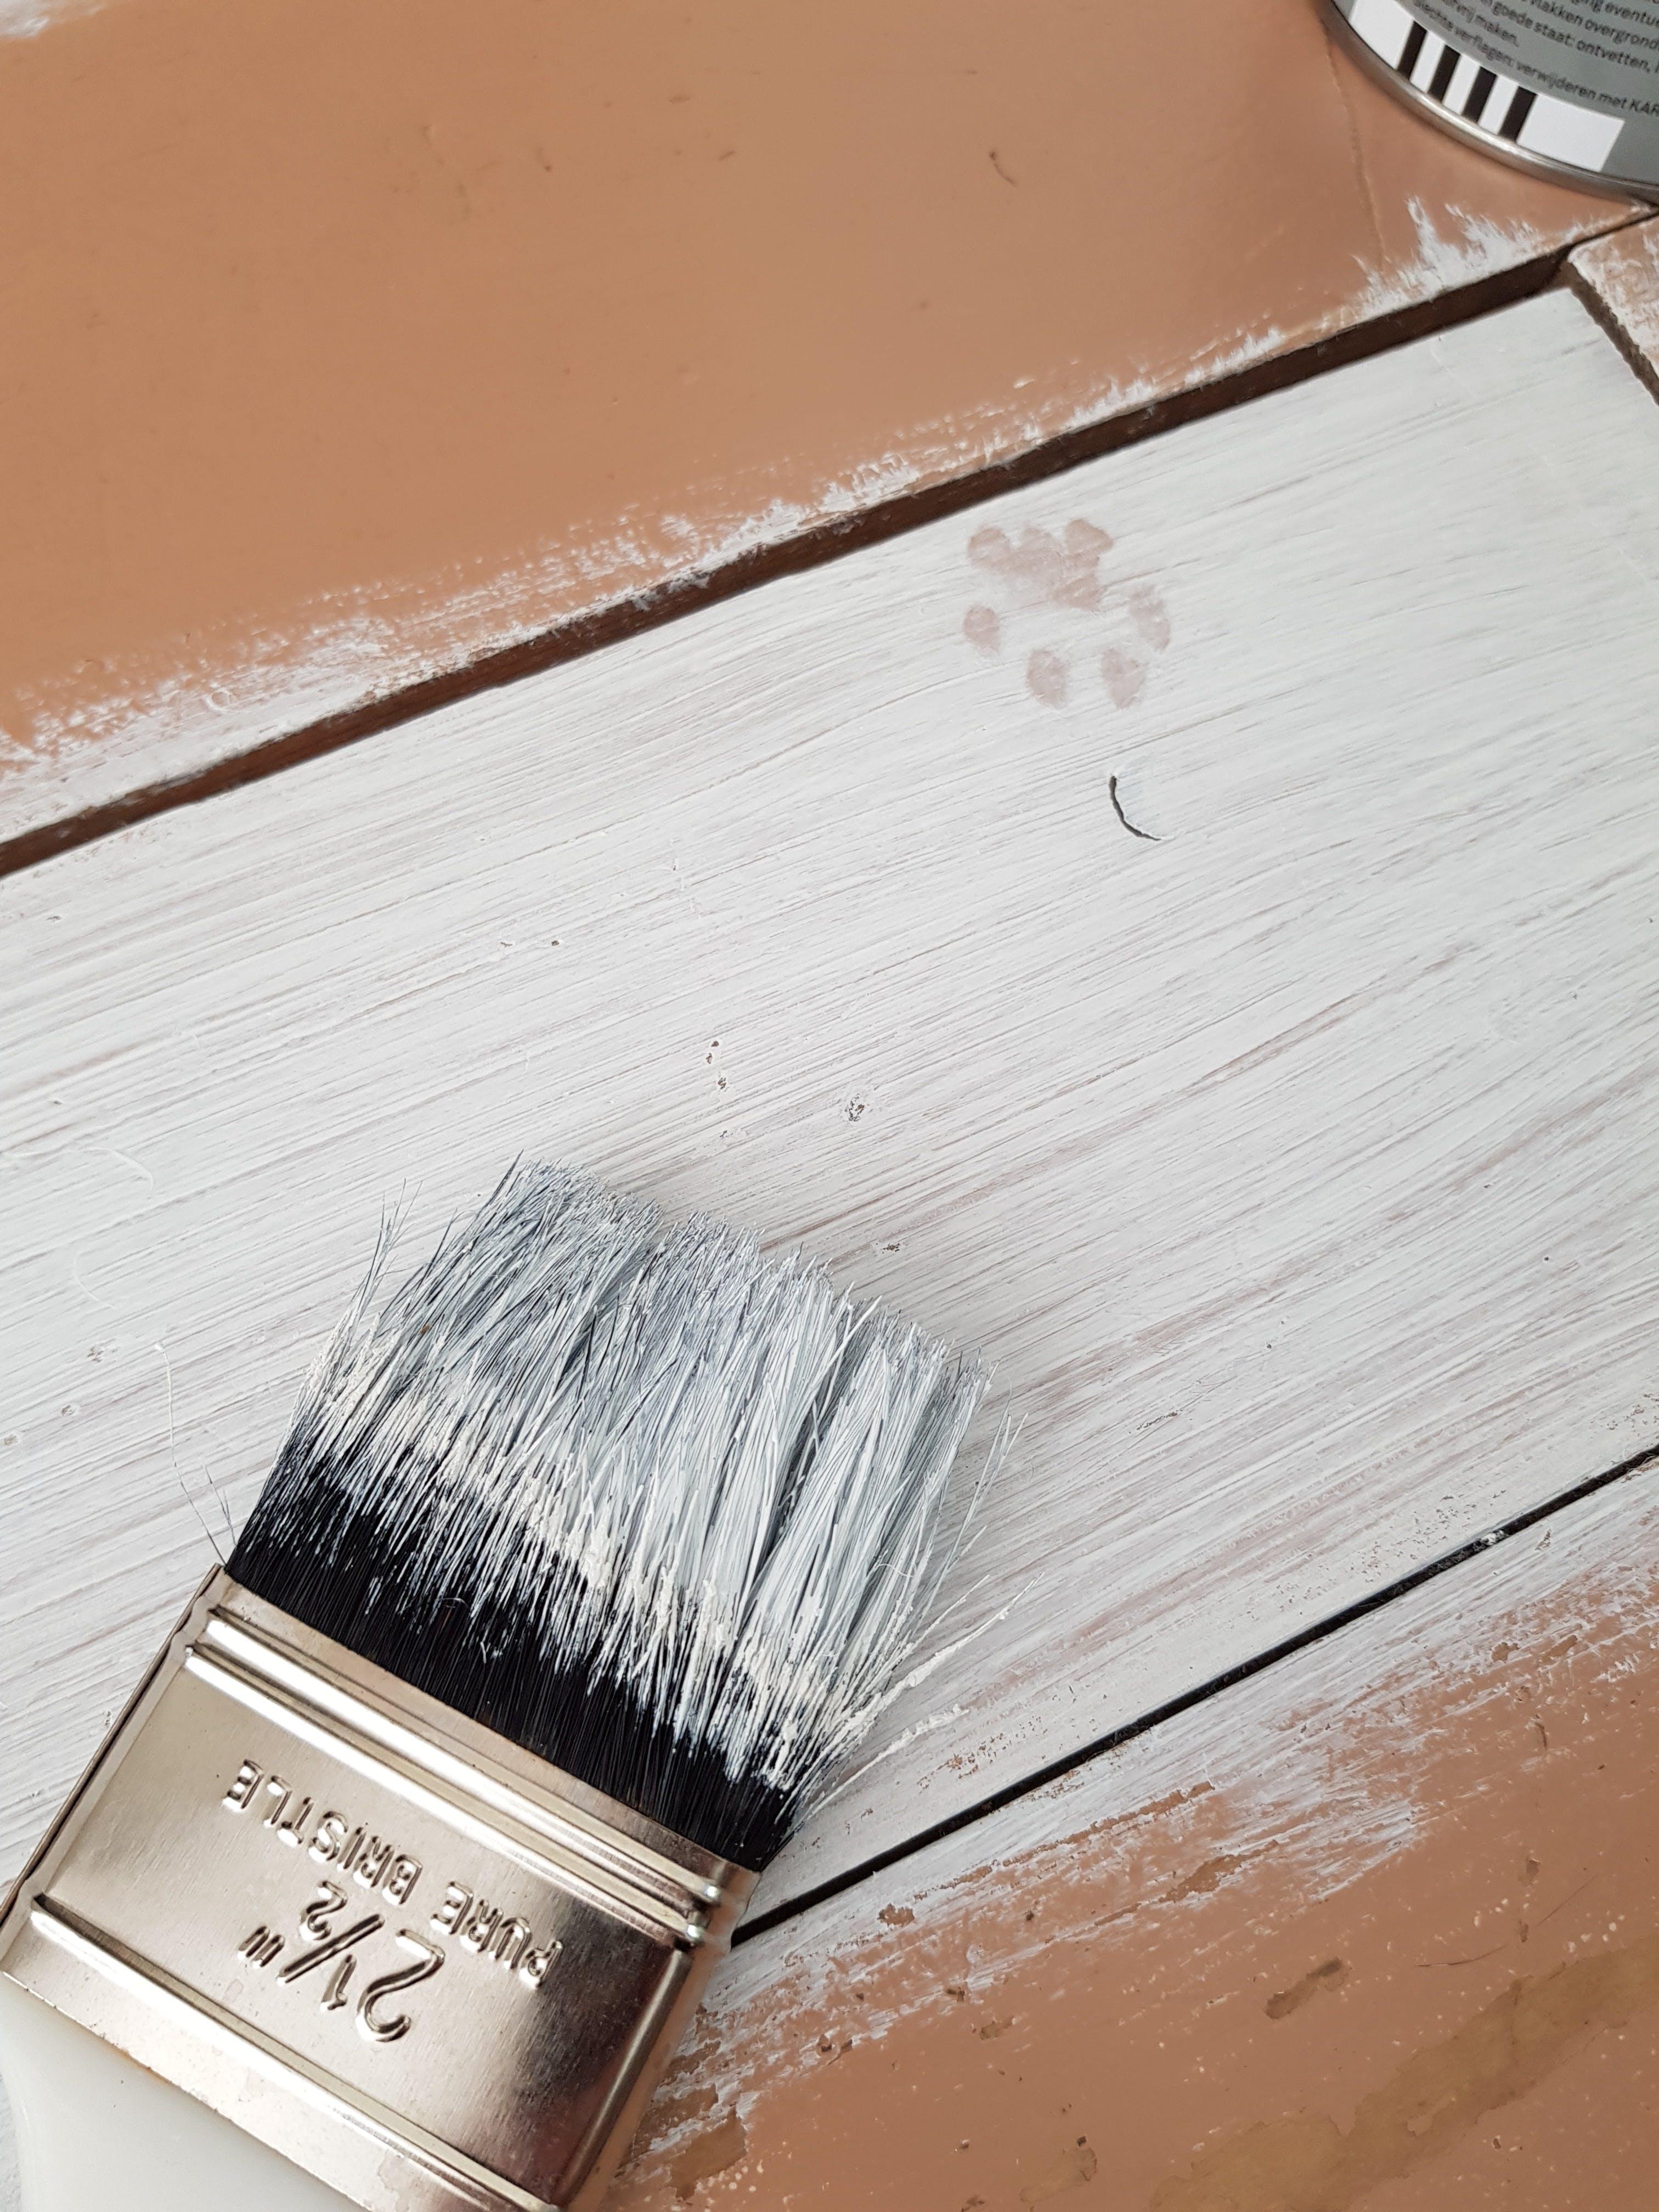 Gratis stockfoto met binnen, blikje, hout, kleuren